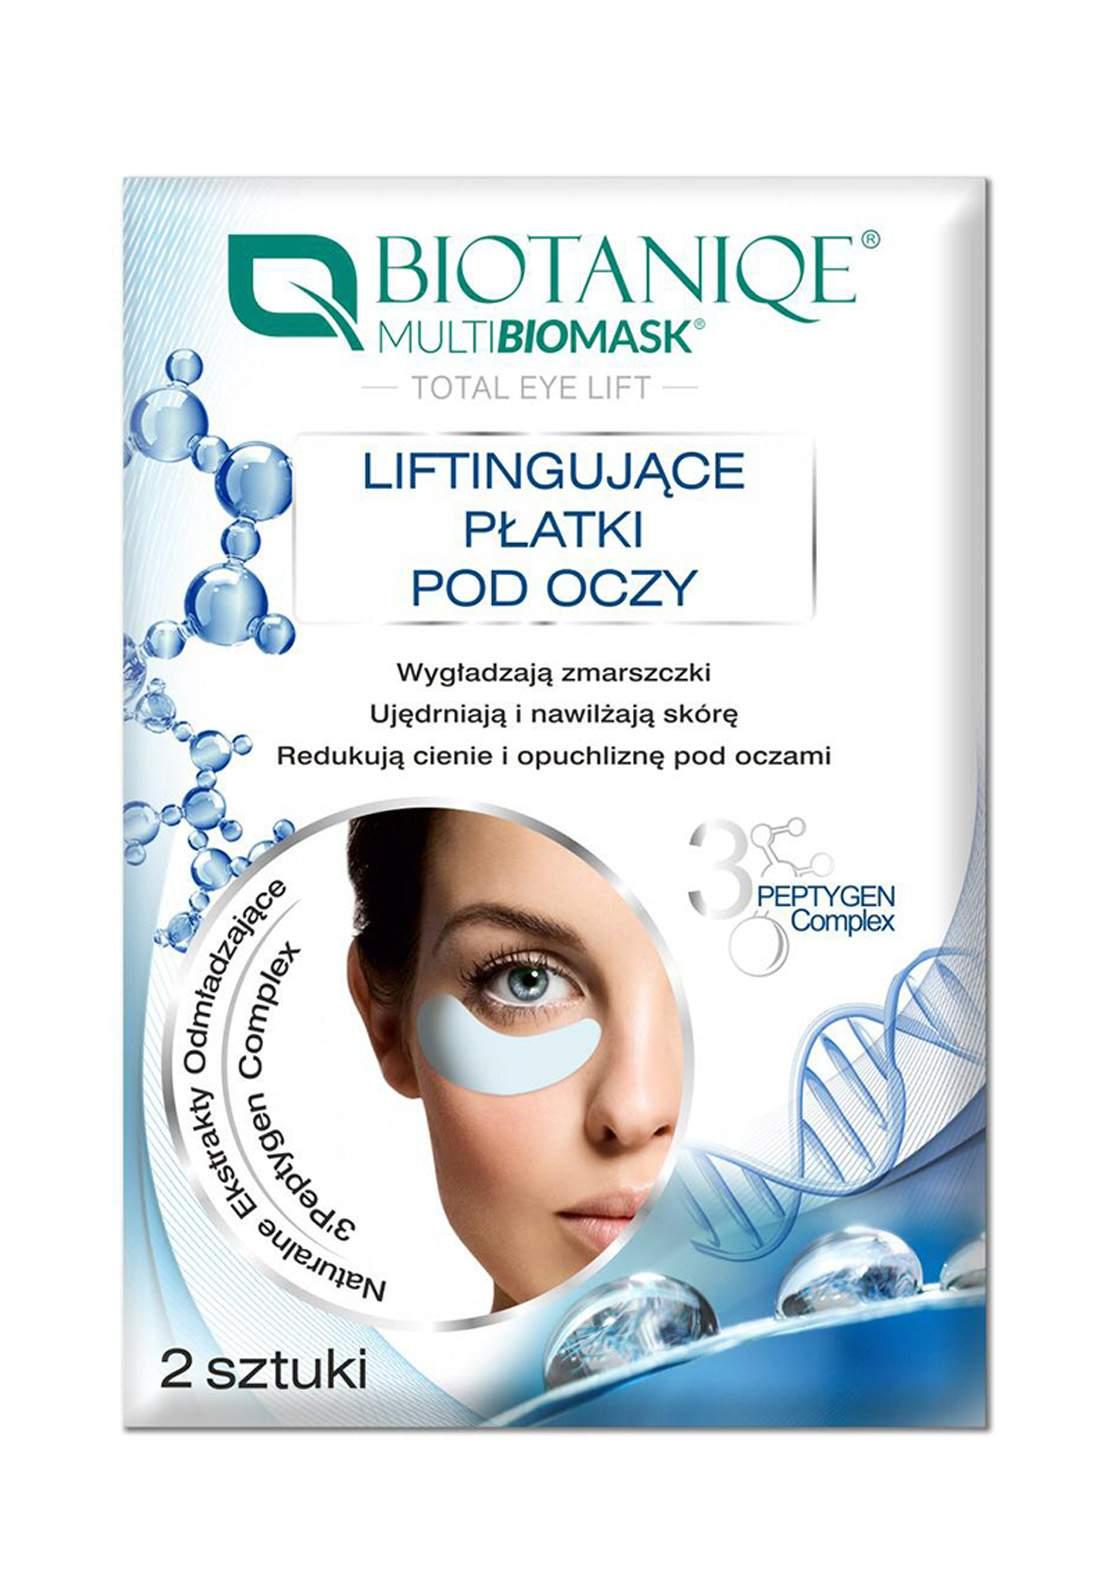 Biotaniqe Lifting Eye Mask 2pcs ماسك للعين